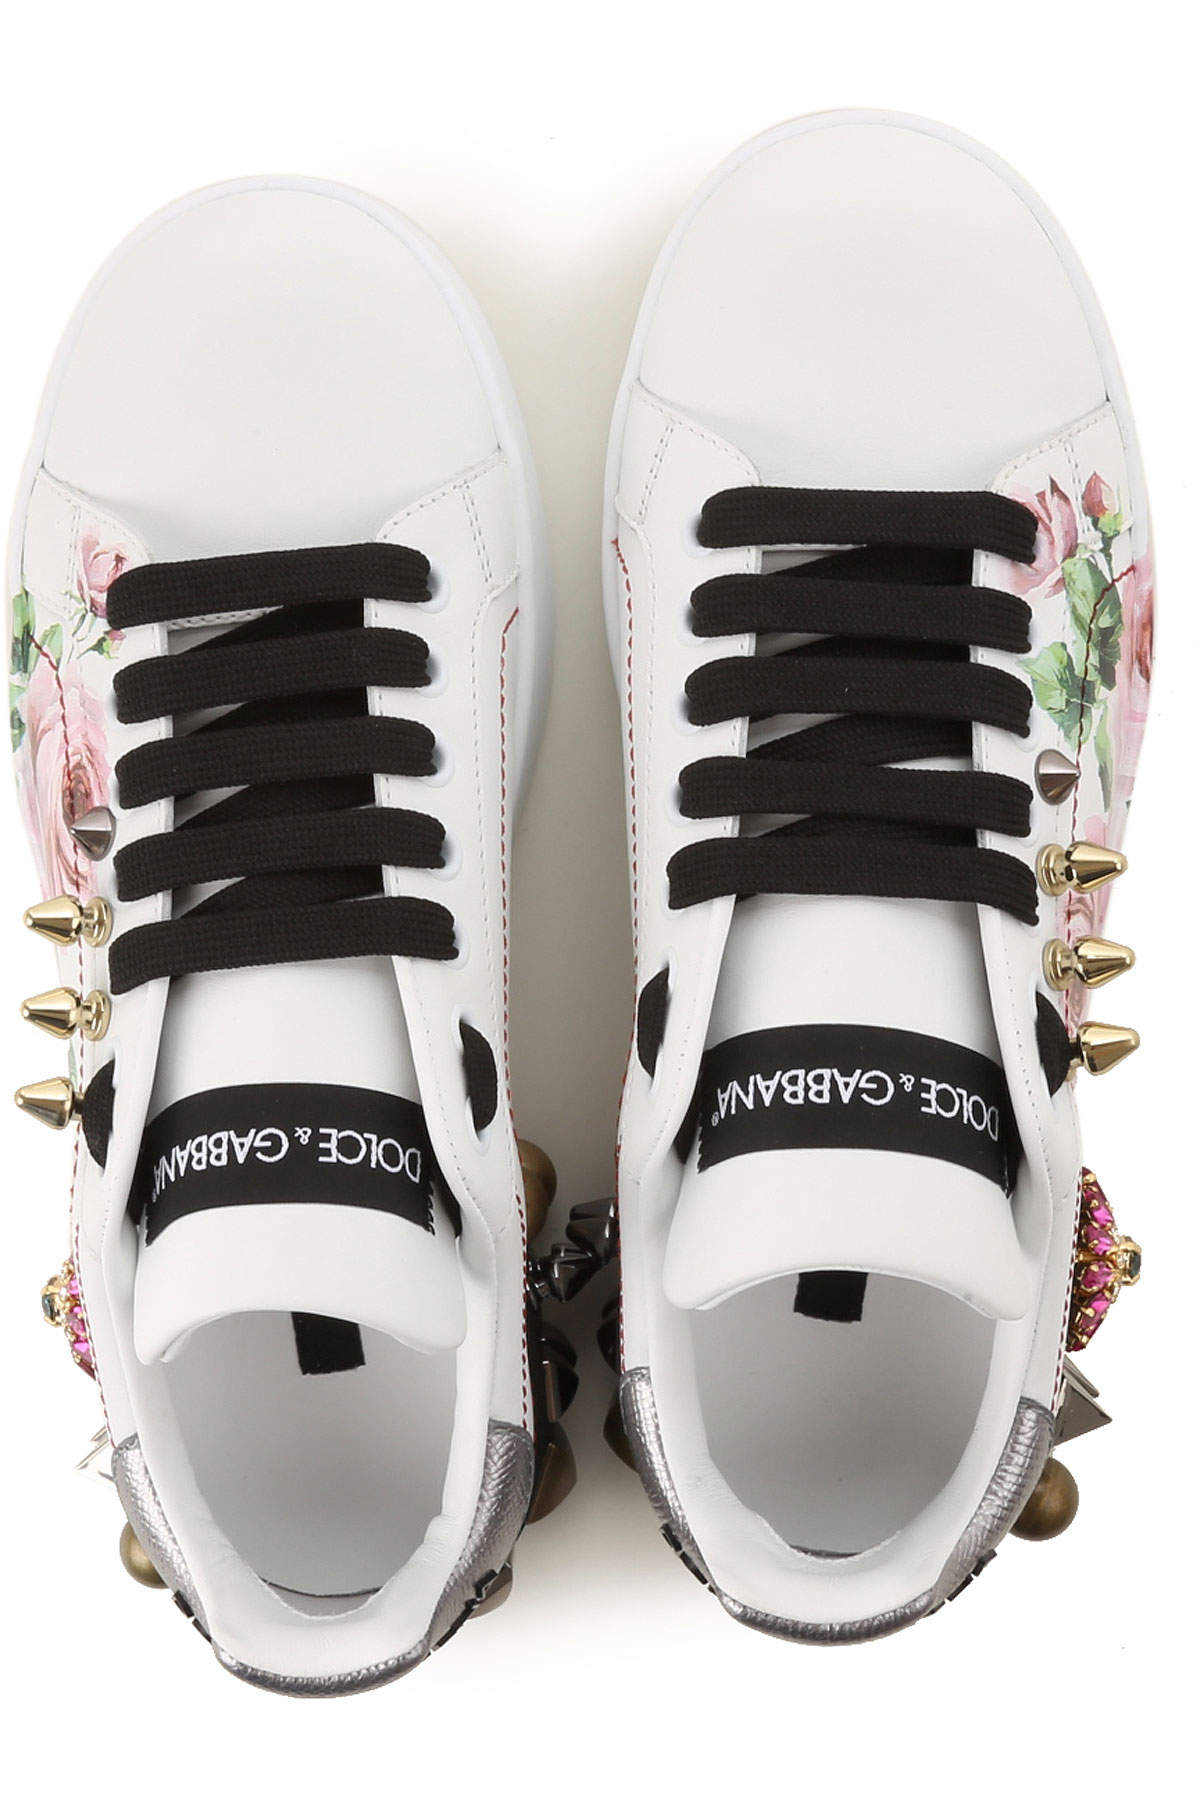 Primavera verano Plata Para Dolce 2019 Gabbana Blanco amp; Mujer Zapatos waxXPAq